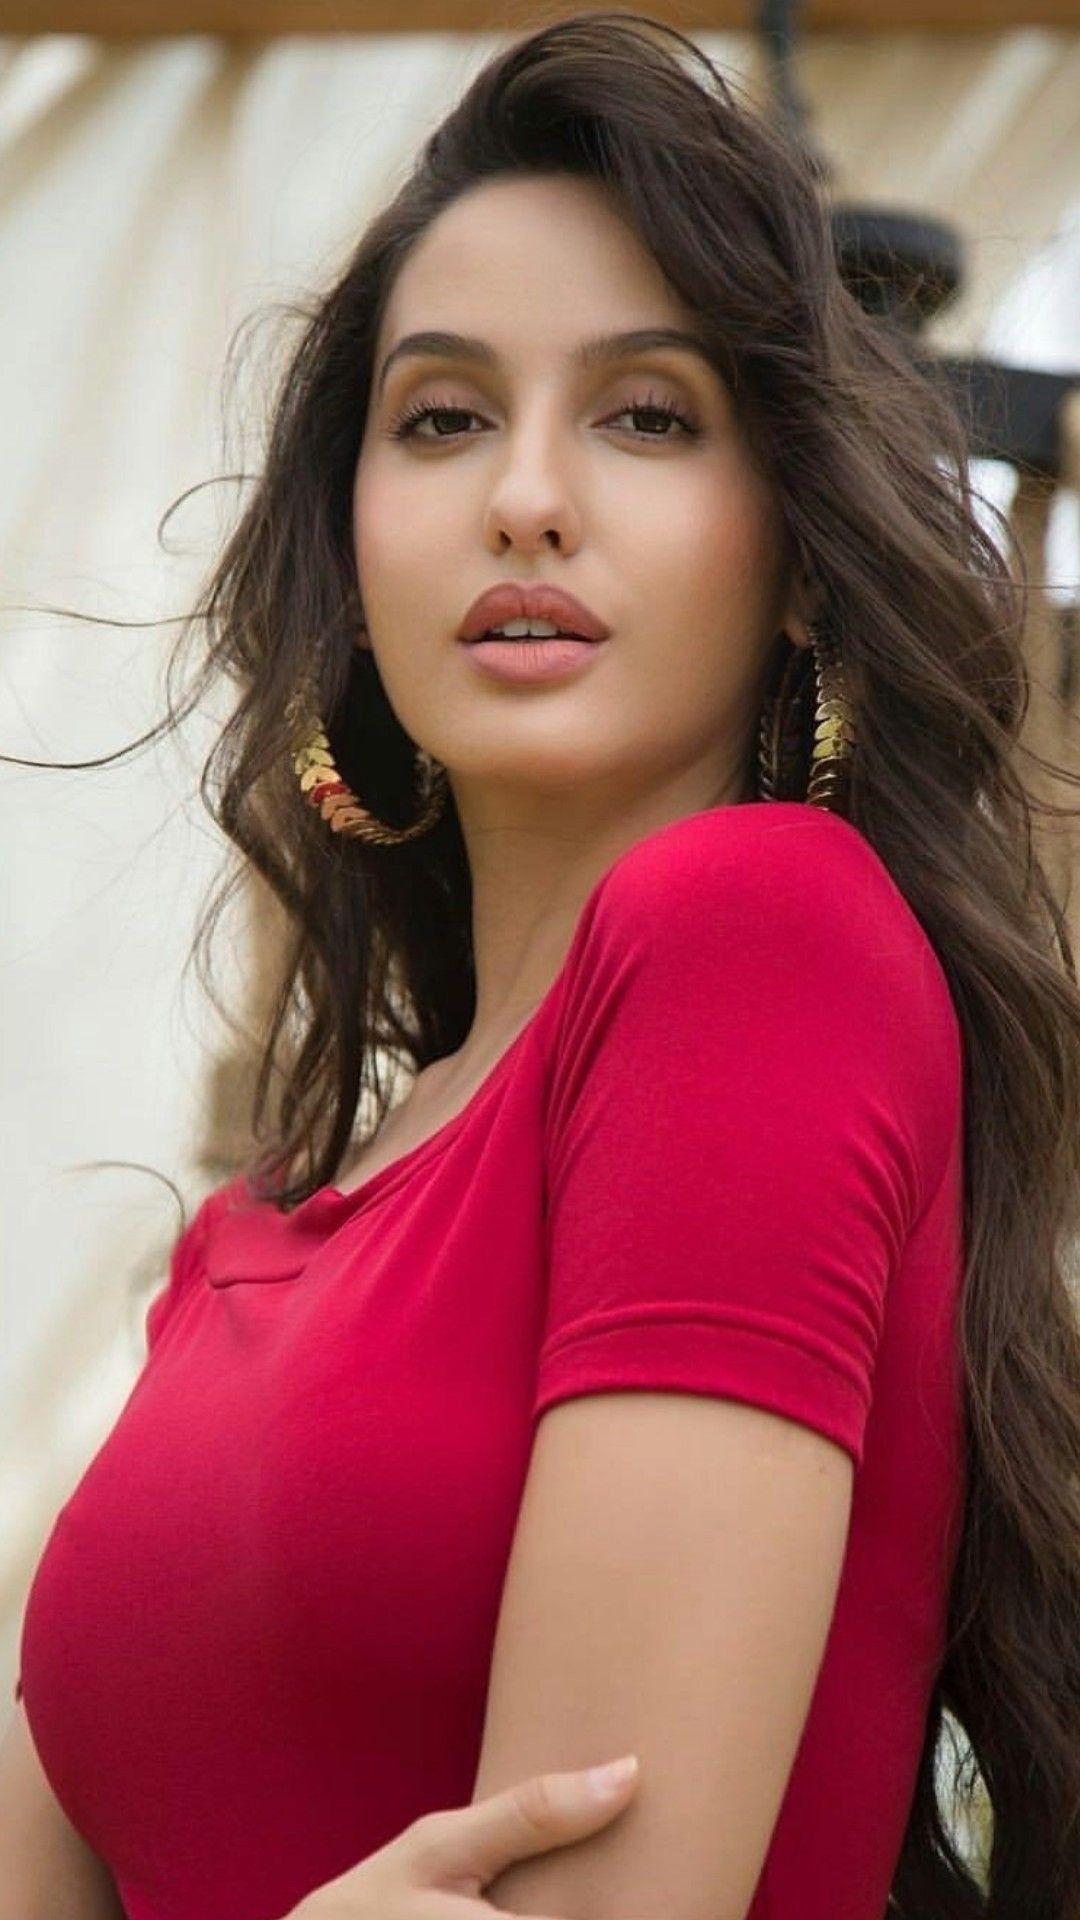 Nora Fateh beauty, Beautiful actresses, Beauty girl